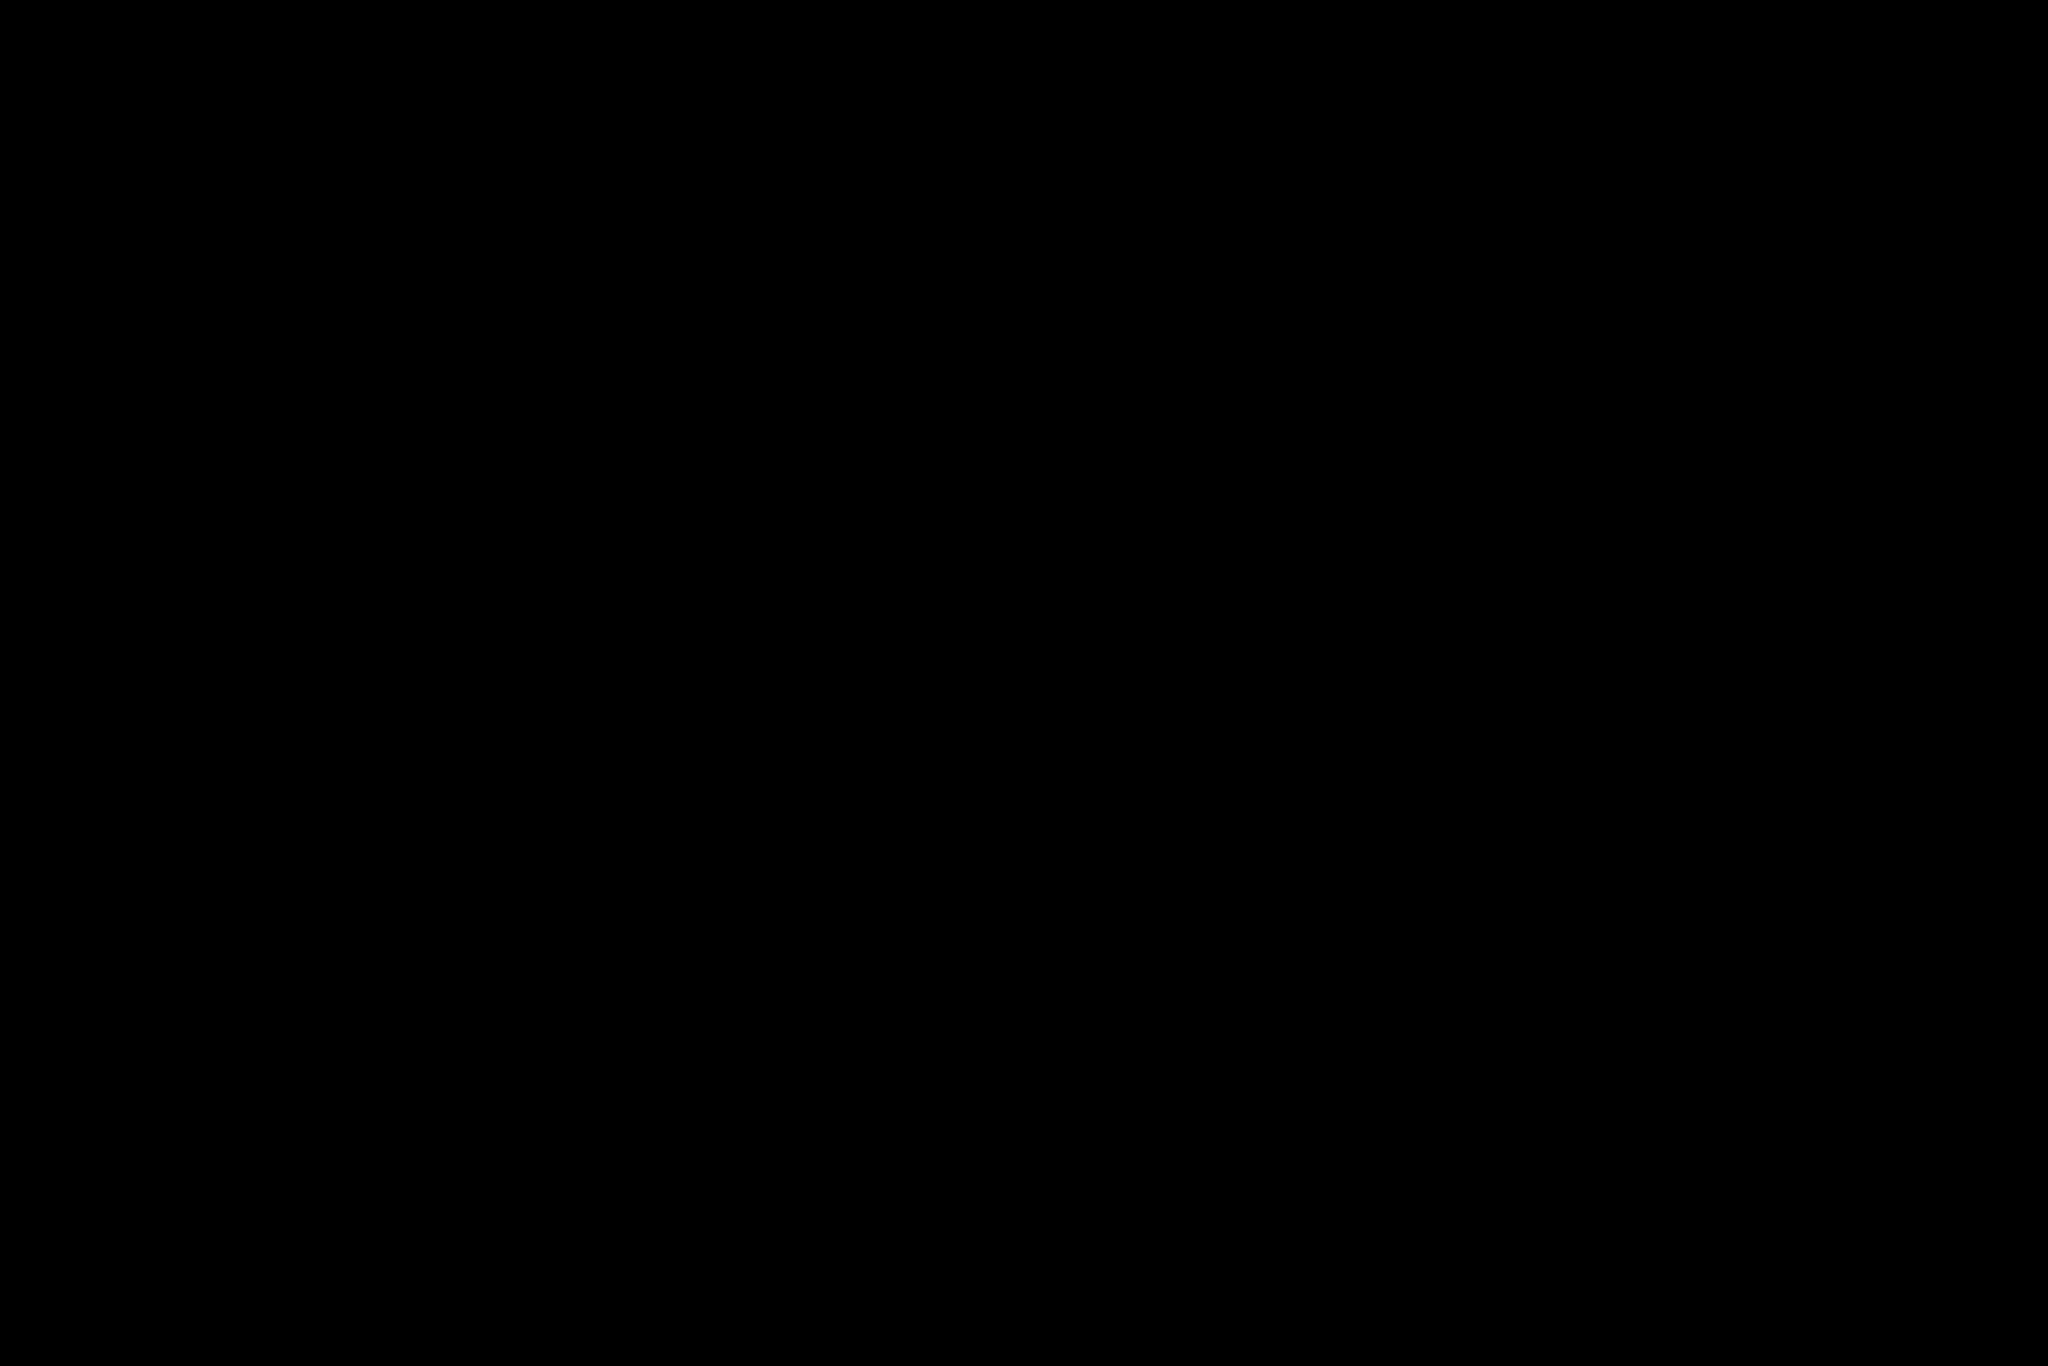 Rochii de mireasa Lorenzo Rossi – model GEORGETTE 2020/21